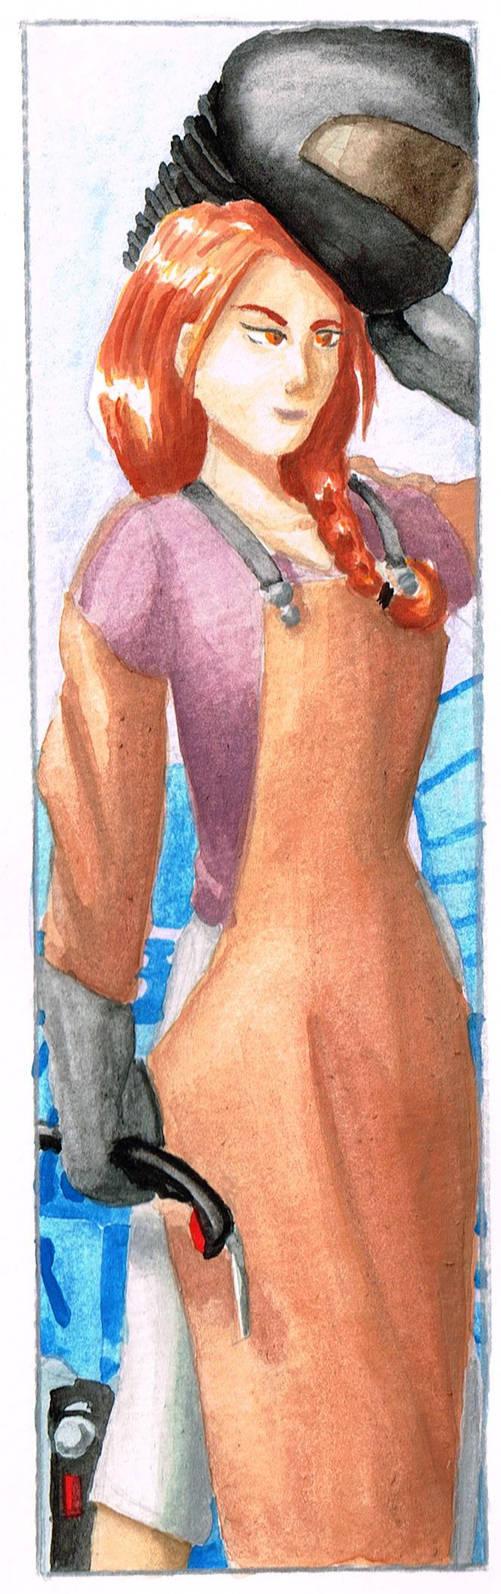 Cold-beige-lipstick mechanic by Akaszik